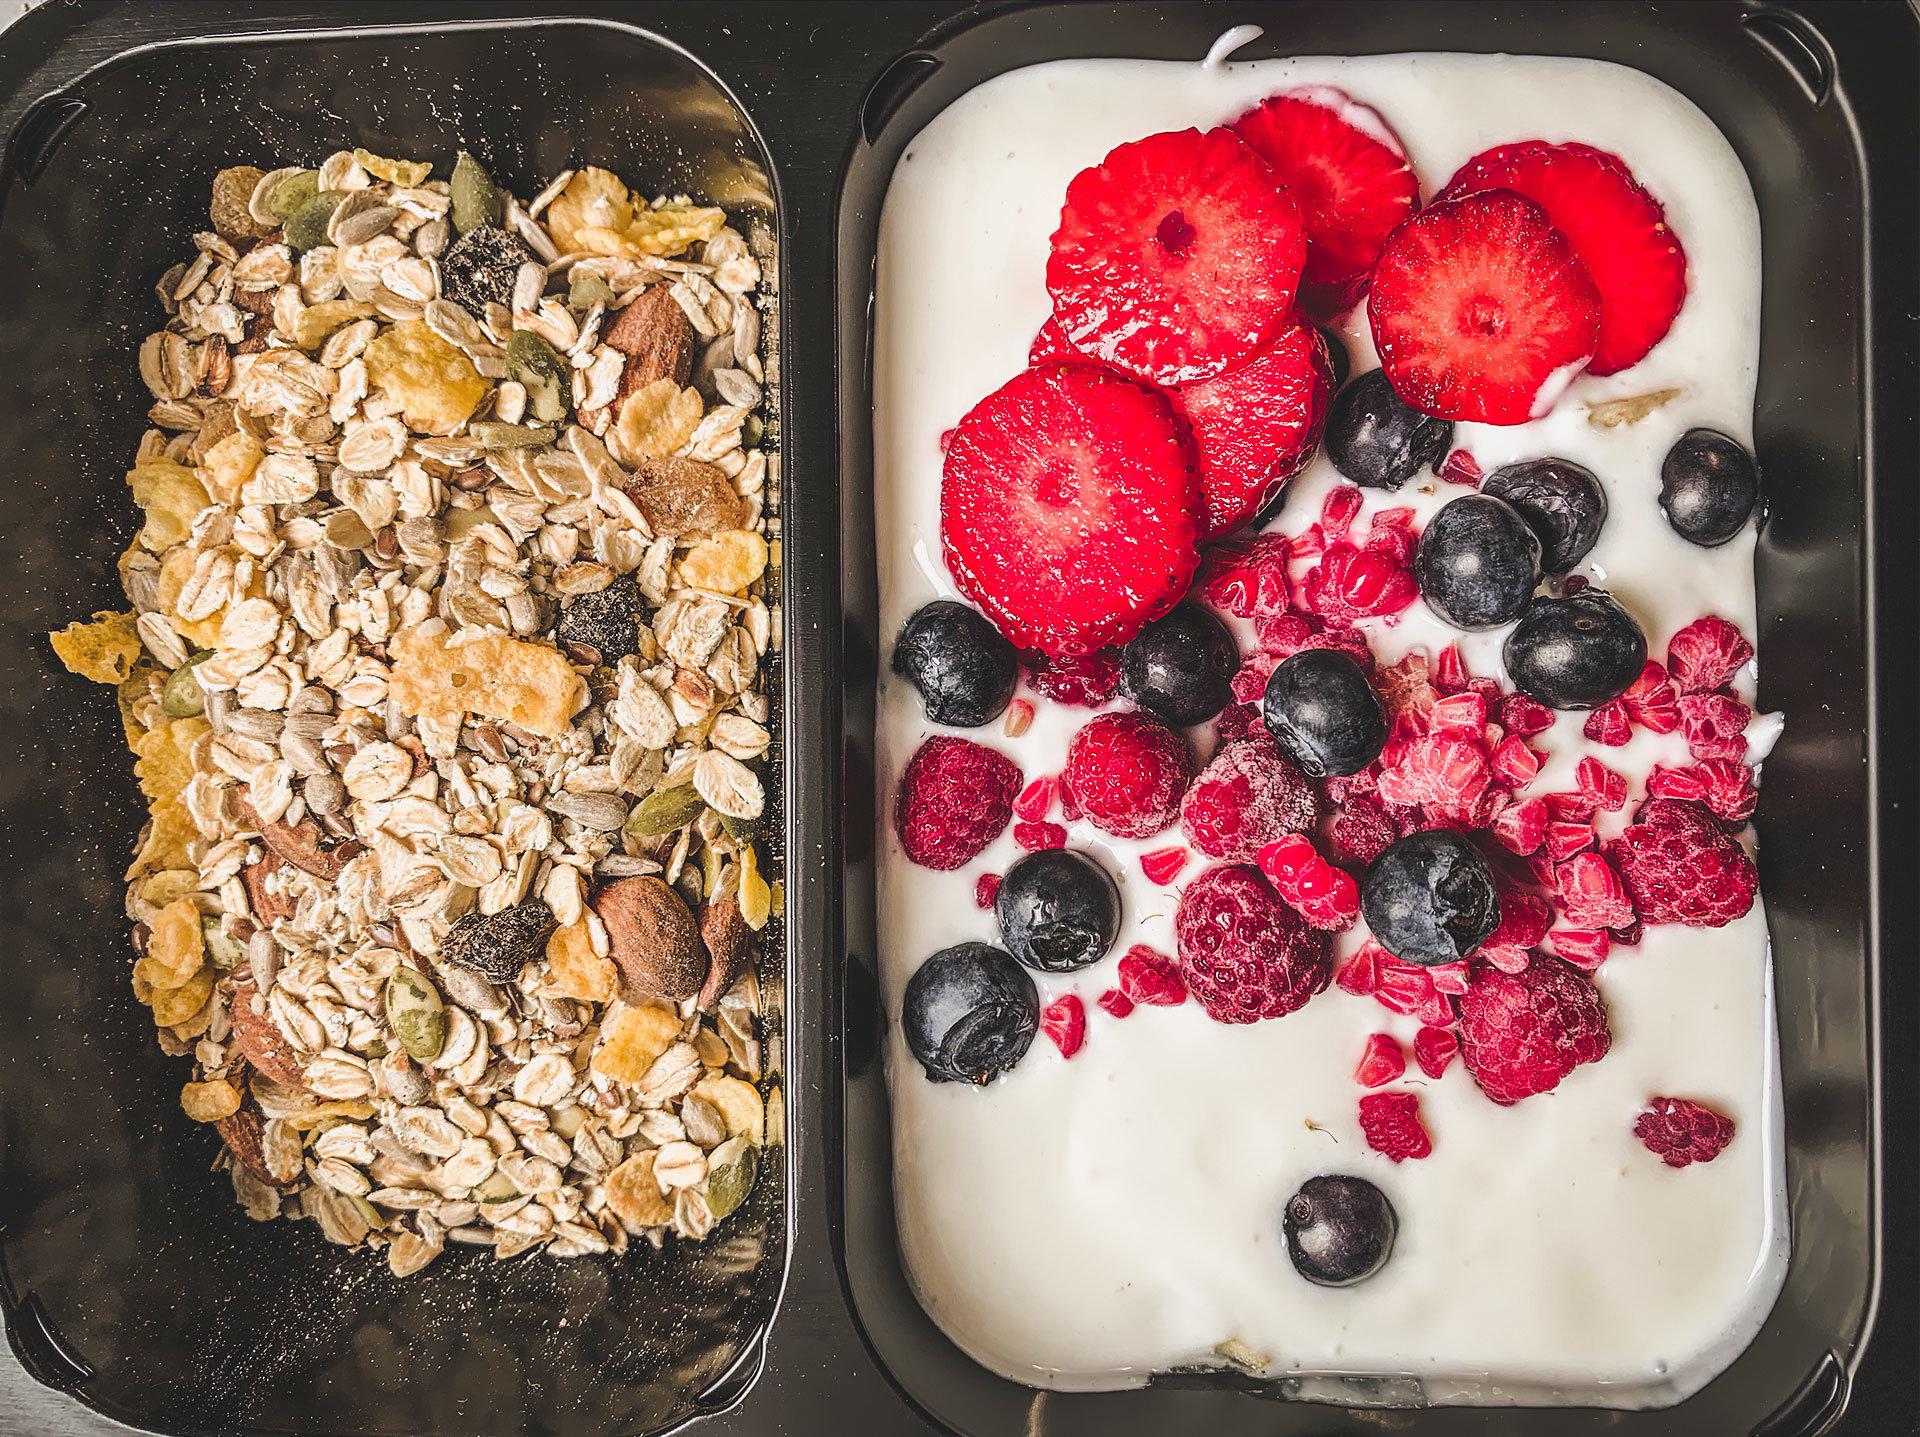 Obrazek Dieta wegetariańska na 20 dni 1700 kalorii